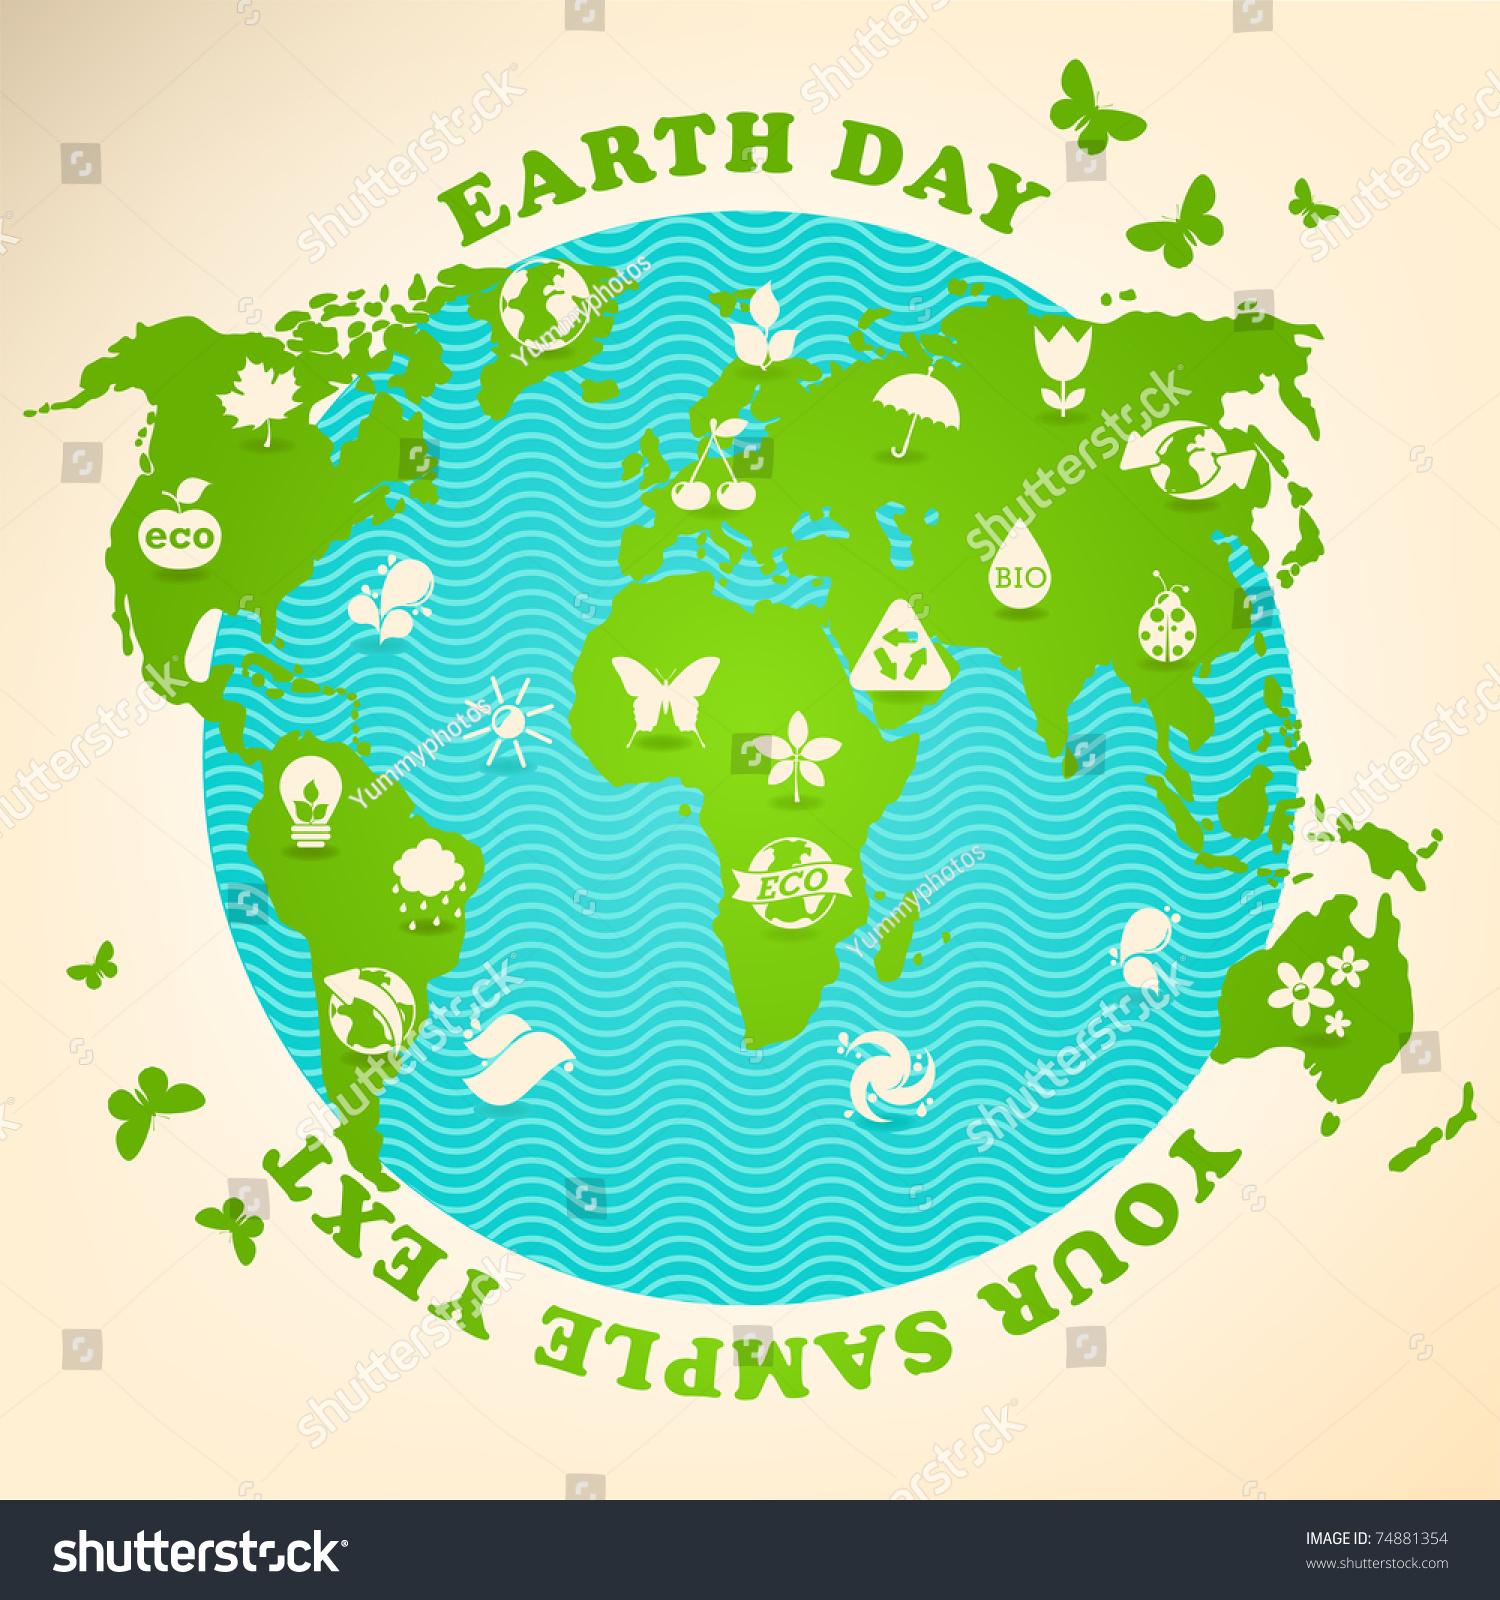 Earth Day Illustration Ecology Symbols Stock Vector Royalty Free